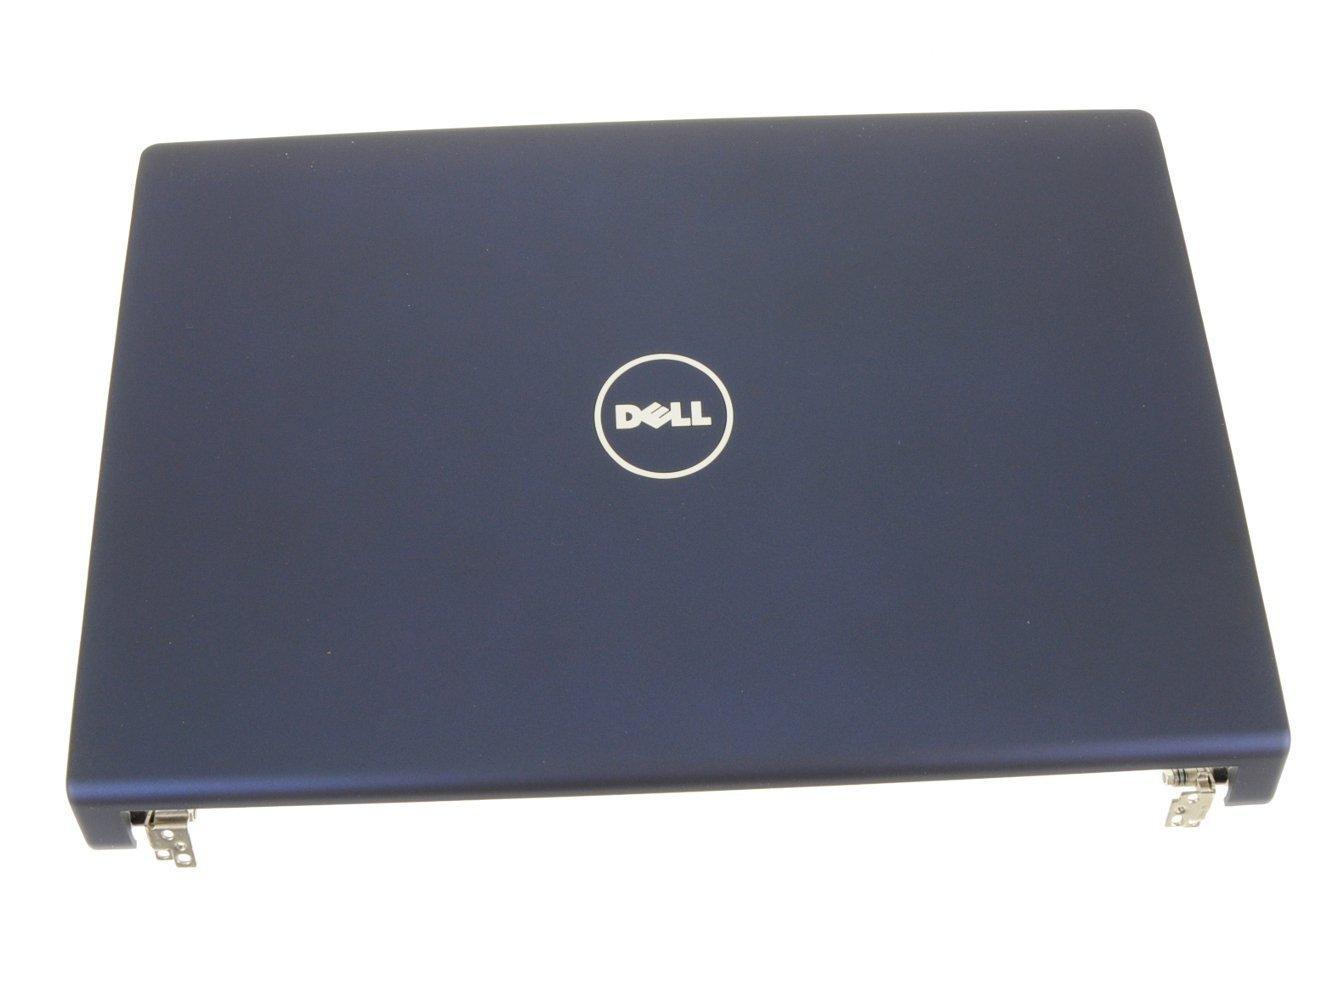 Dell Studio 1555 1557 1558 LCD Back Cover Lid Plastic - 7DCV3